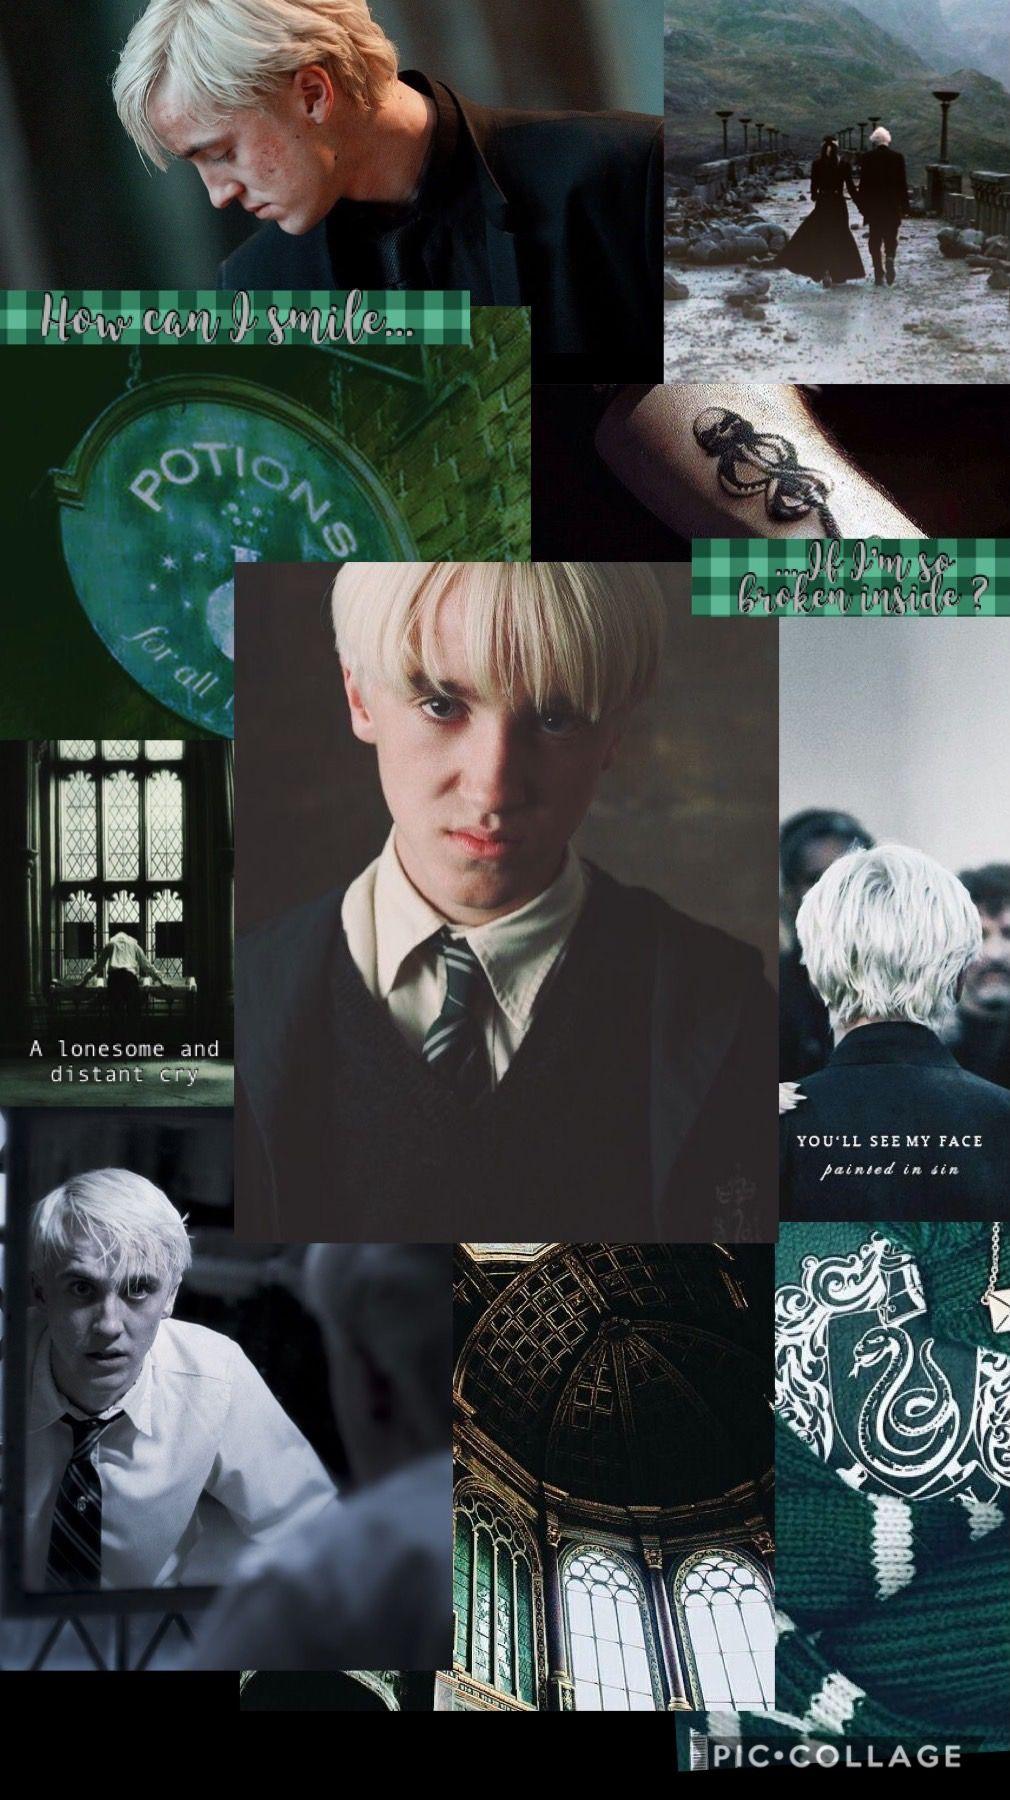 Draco Malfoy Dracomalfoy Harrypotter Hogwarts Draco Malfoy Malfoy Draco Malfoy Aesthetic